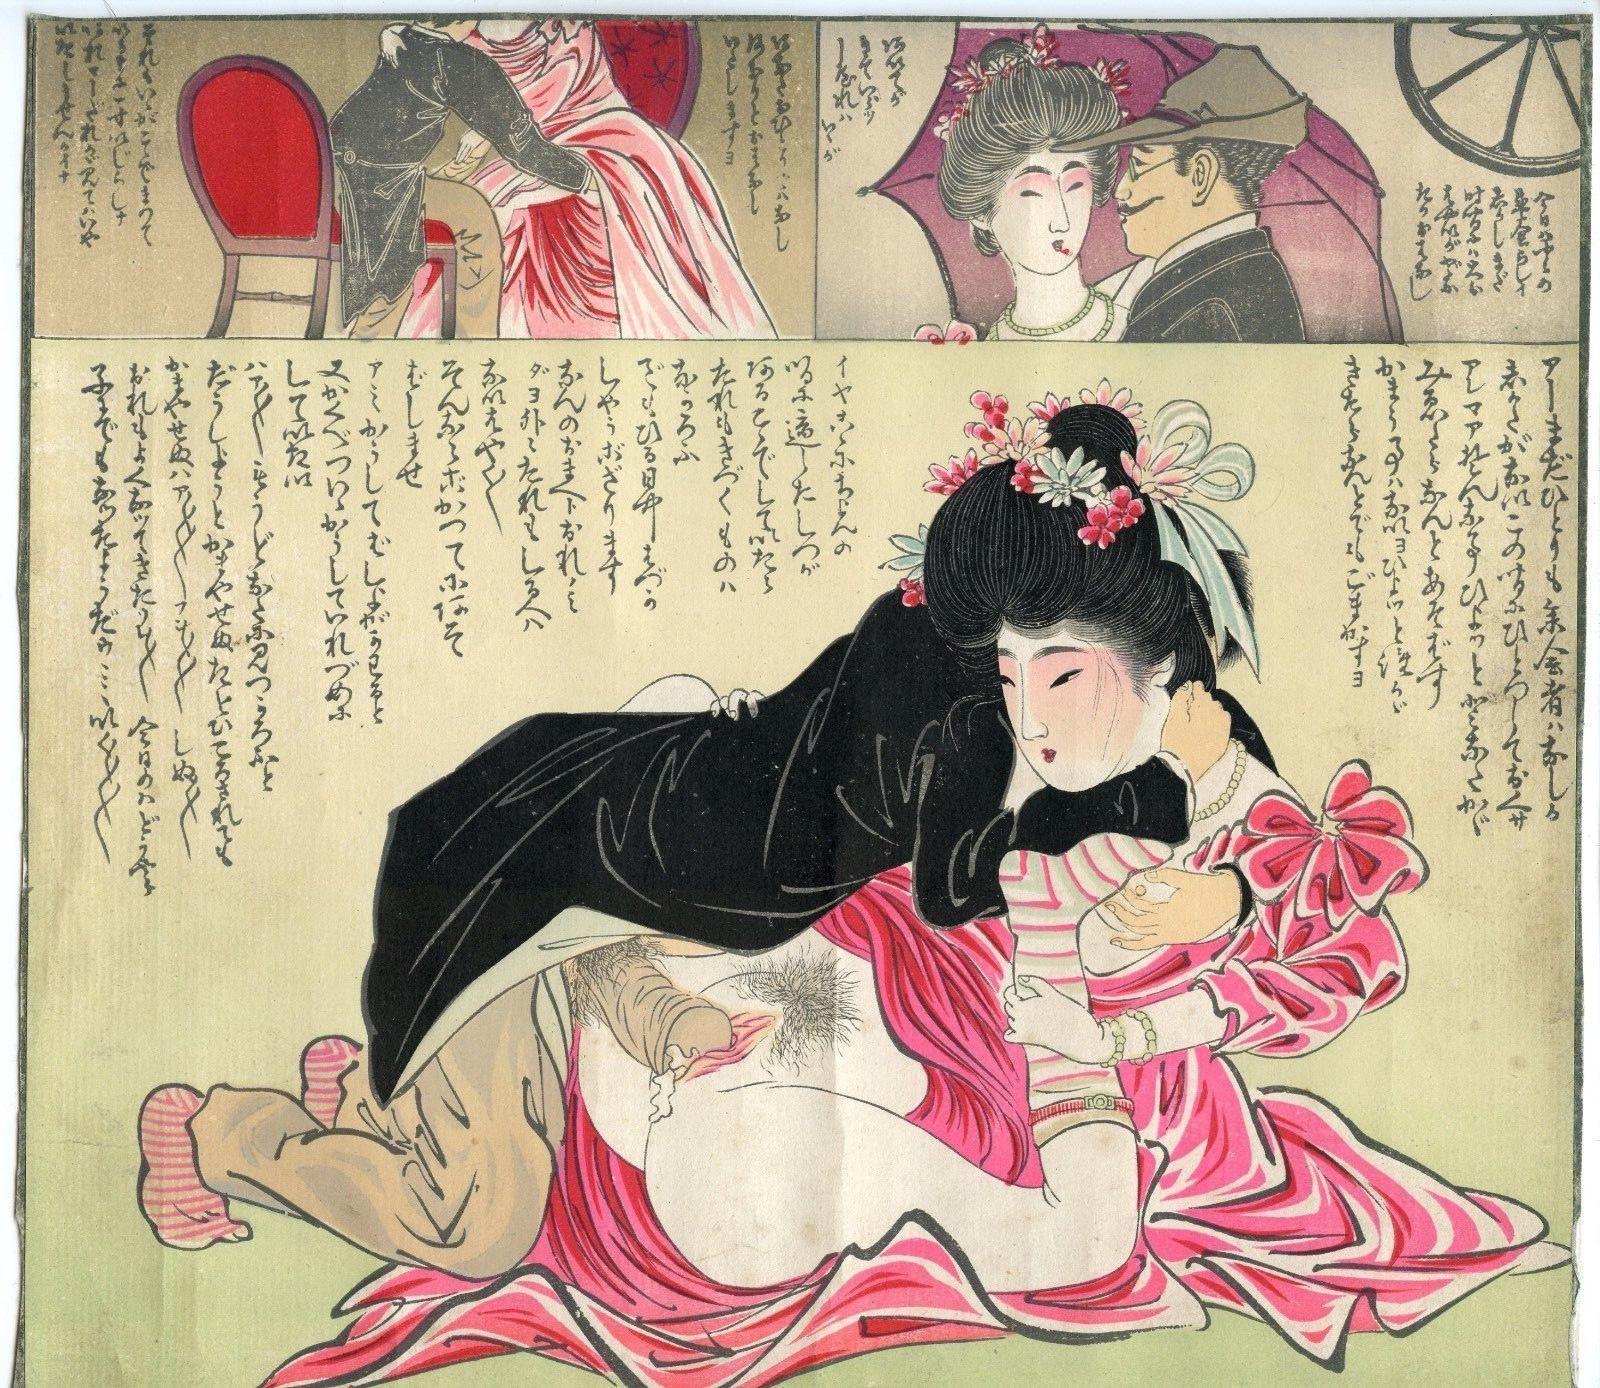 Japanese erotic cartoon